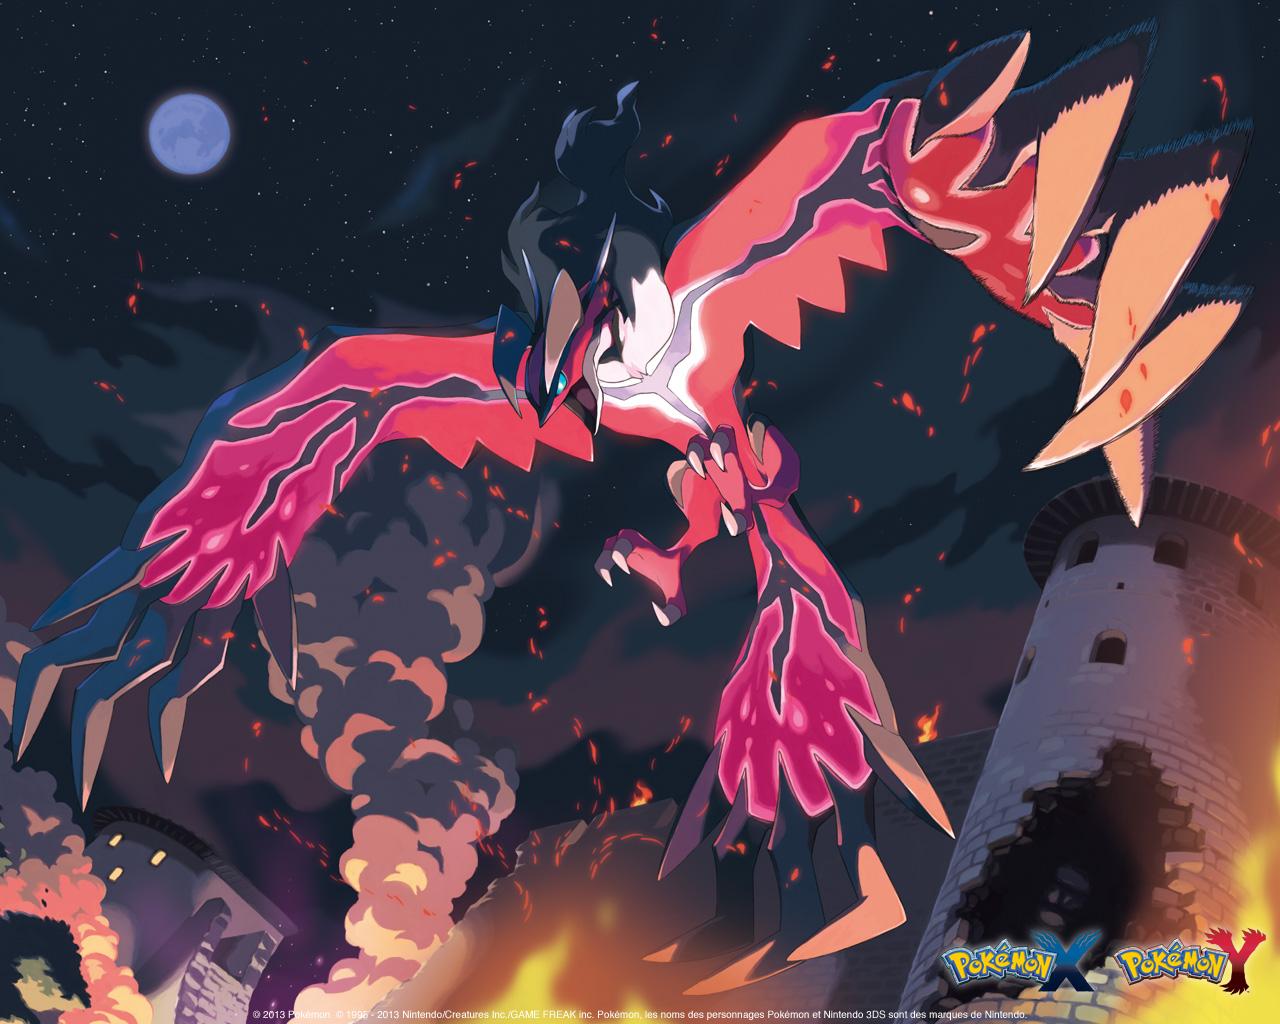 Vos fond d'écran du moment. Yveltal-Pokemon-X-and-Y_1280x1024_fr